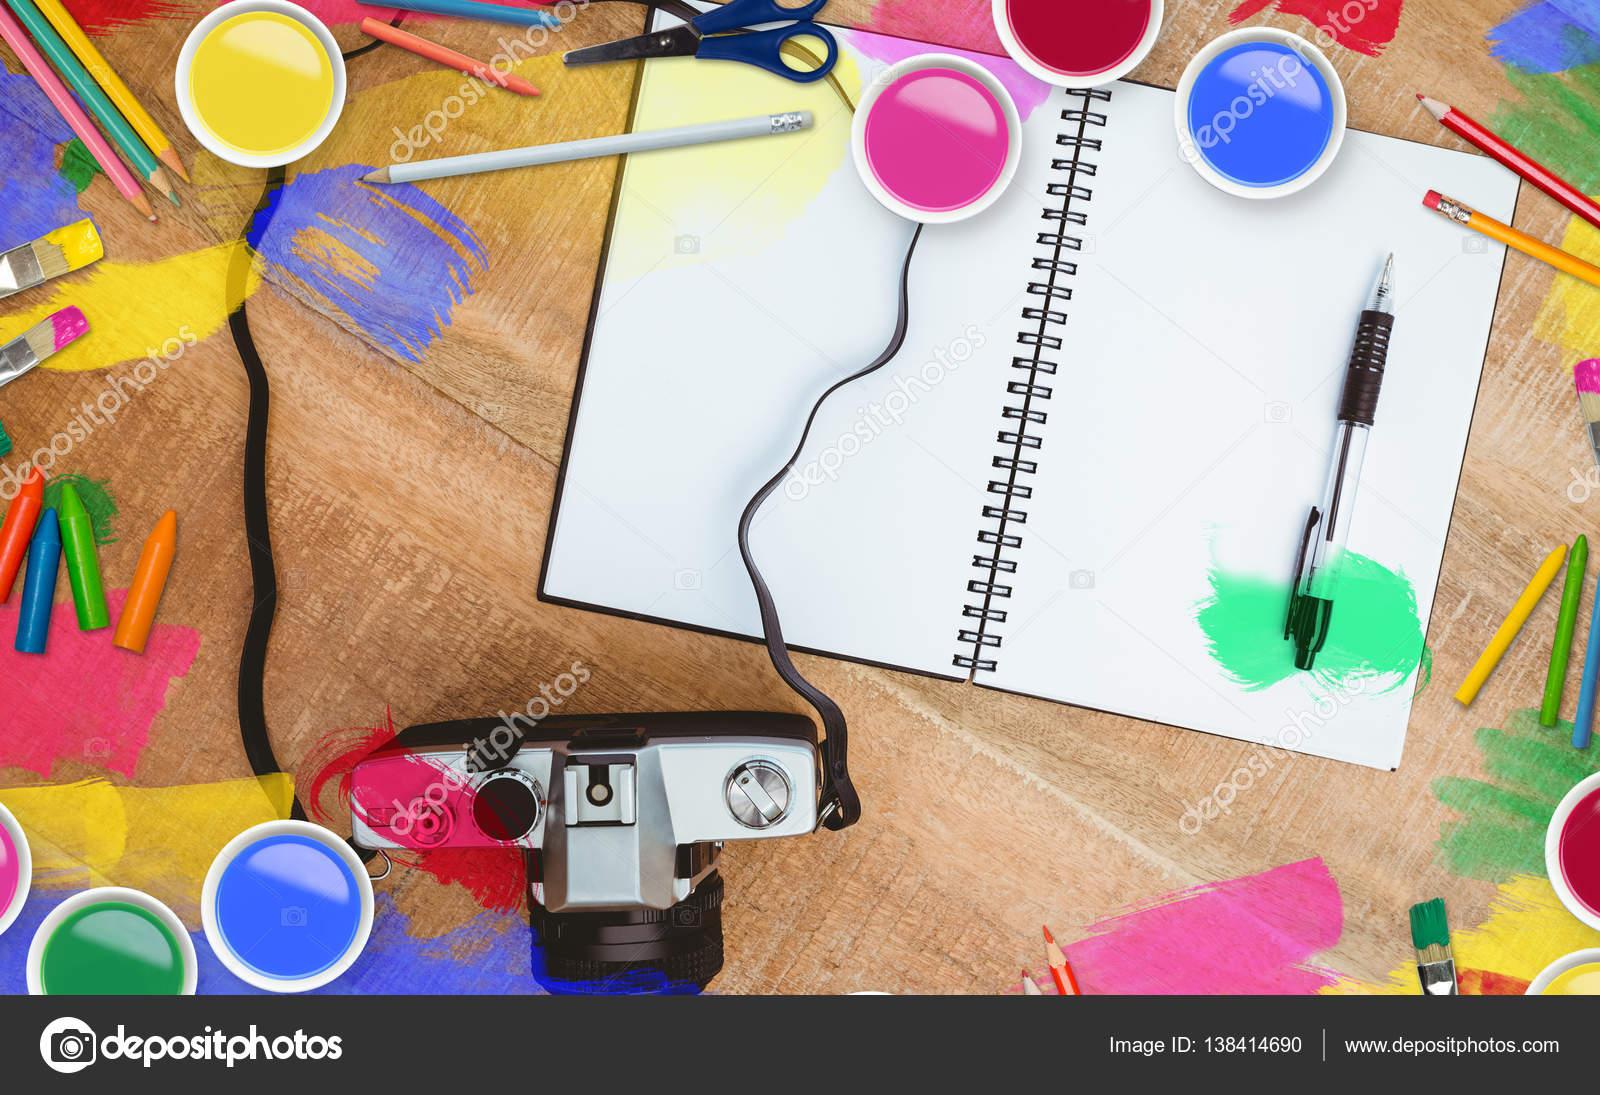 Schreibgerät mit Sofortbild-Kamera — Stockfoto © Wavebreakmedia ...